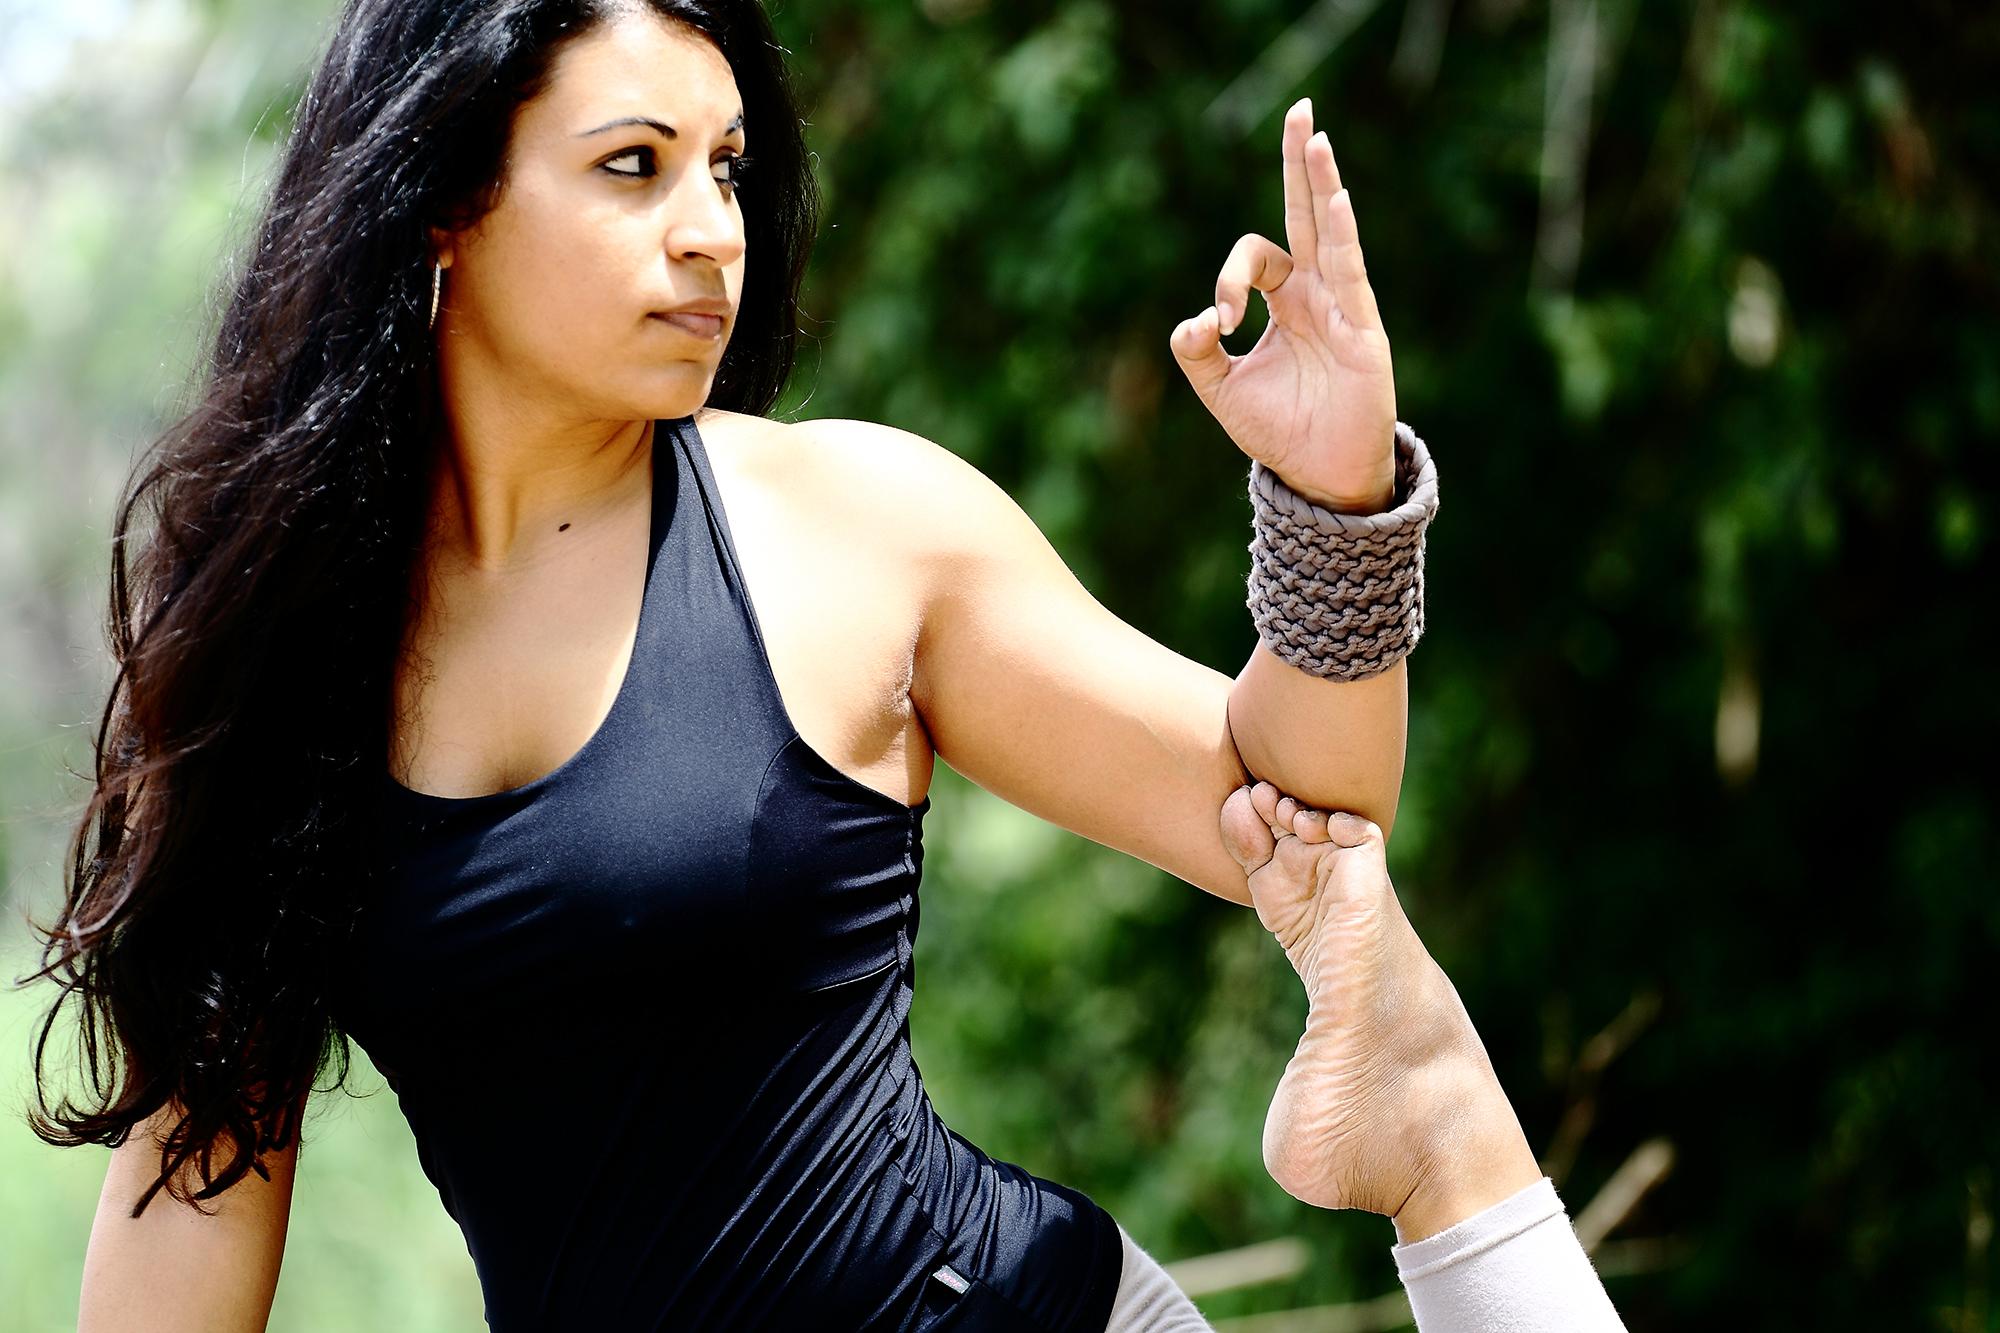 reshma-thakkar-yogi-made-with-a-purpose.jpg